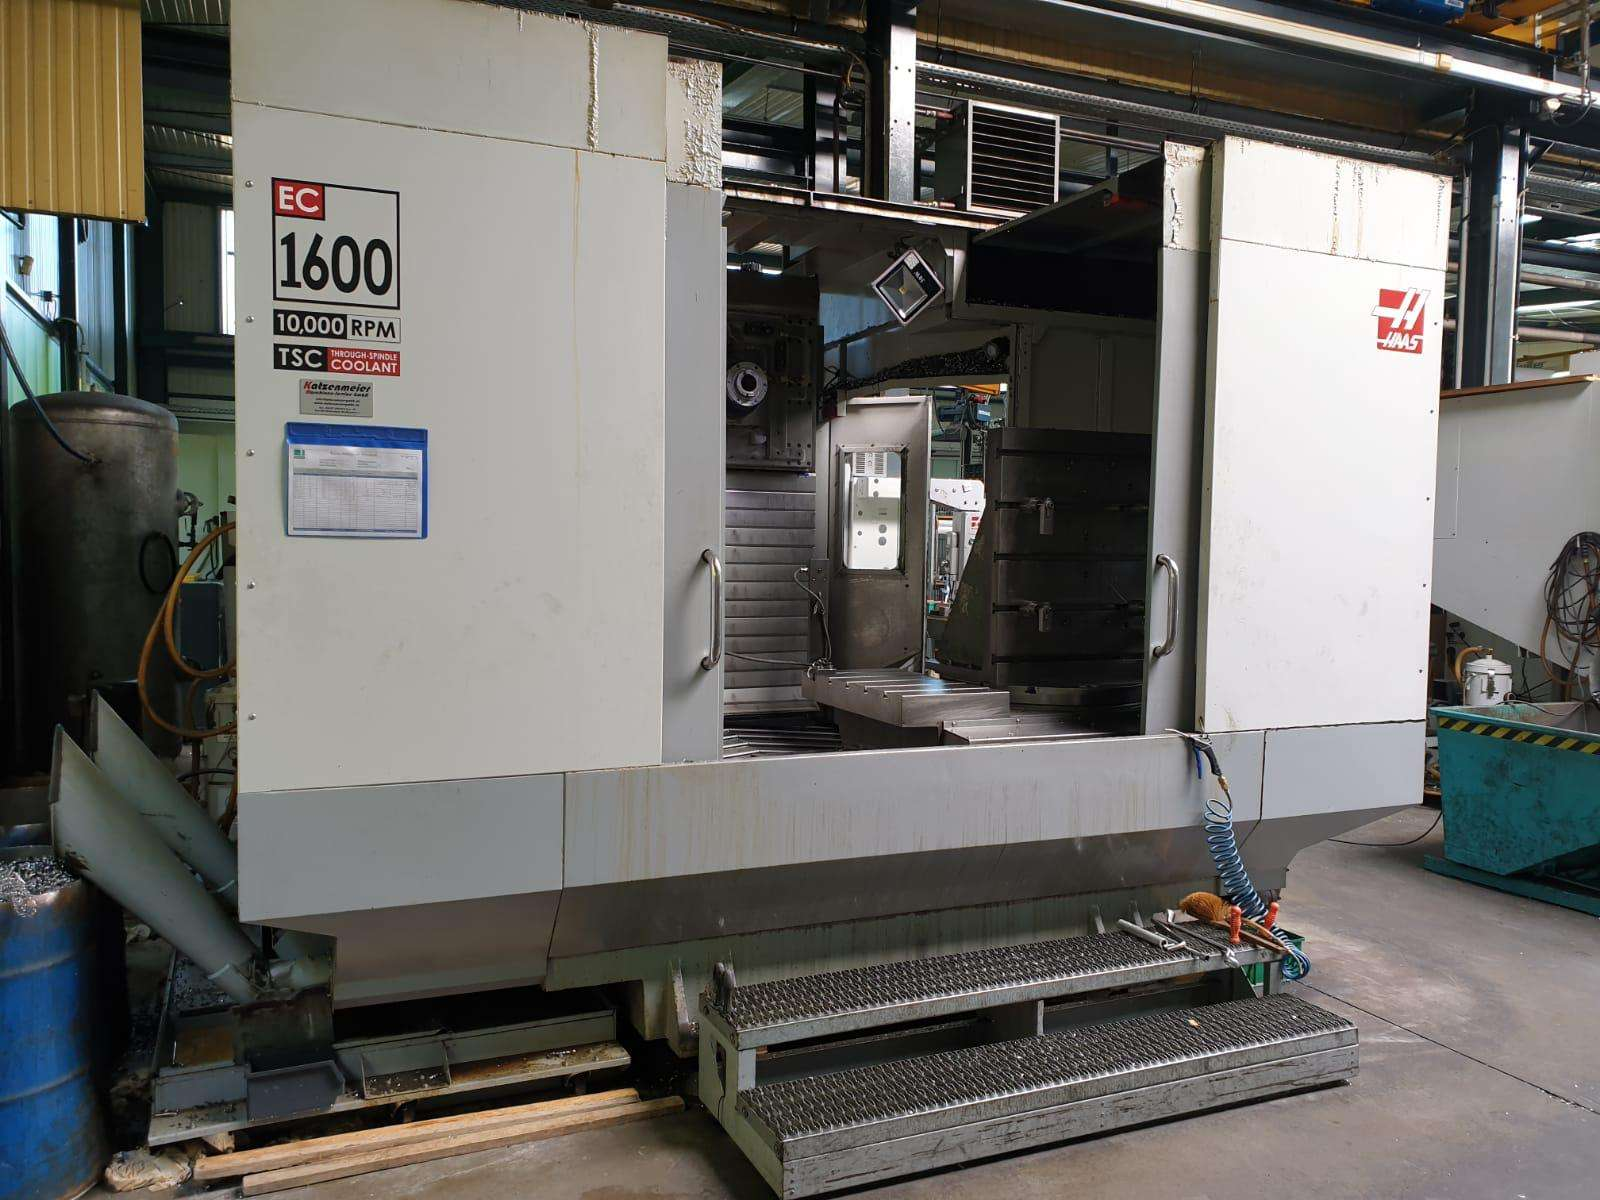 Gebrauchtmaschinen Haas EC-1600